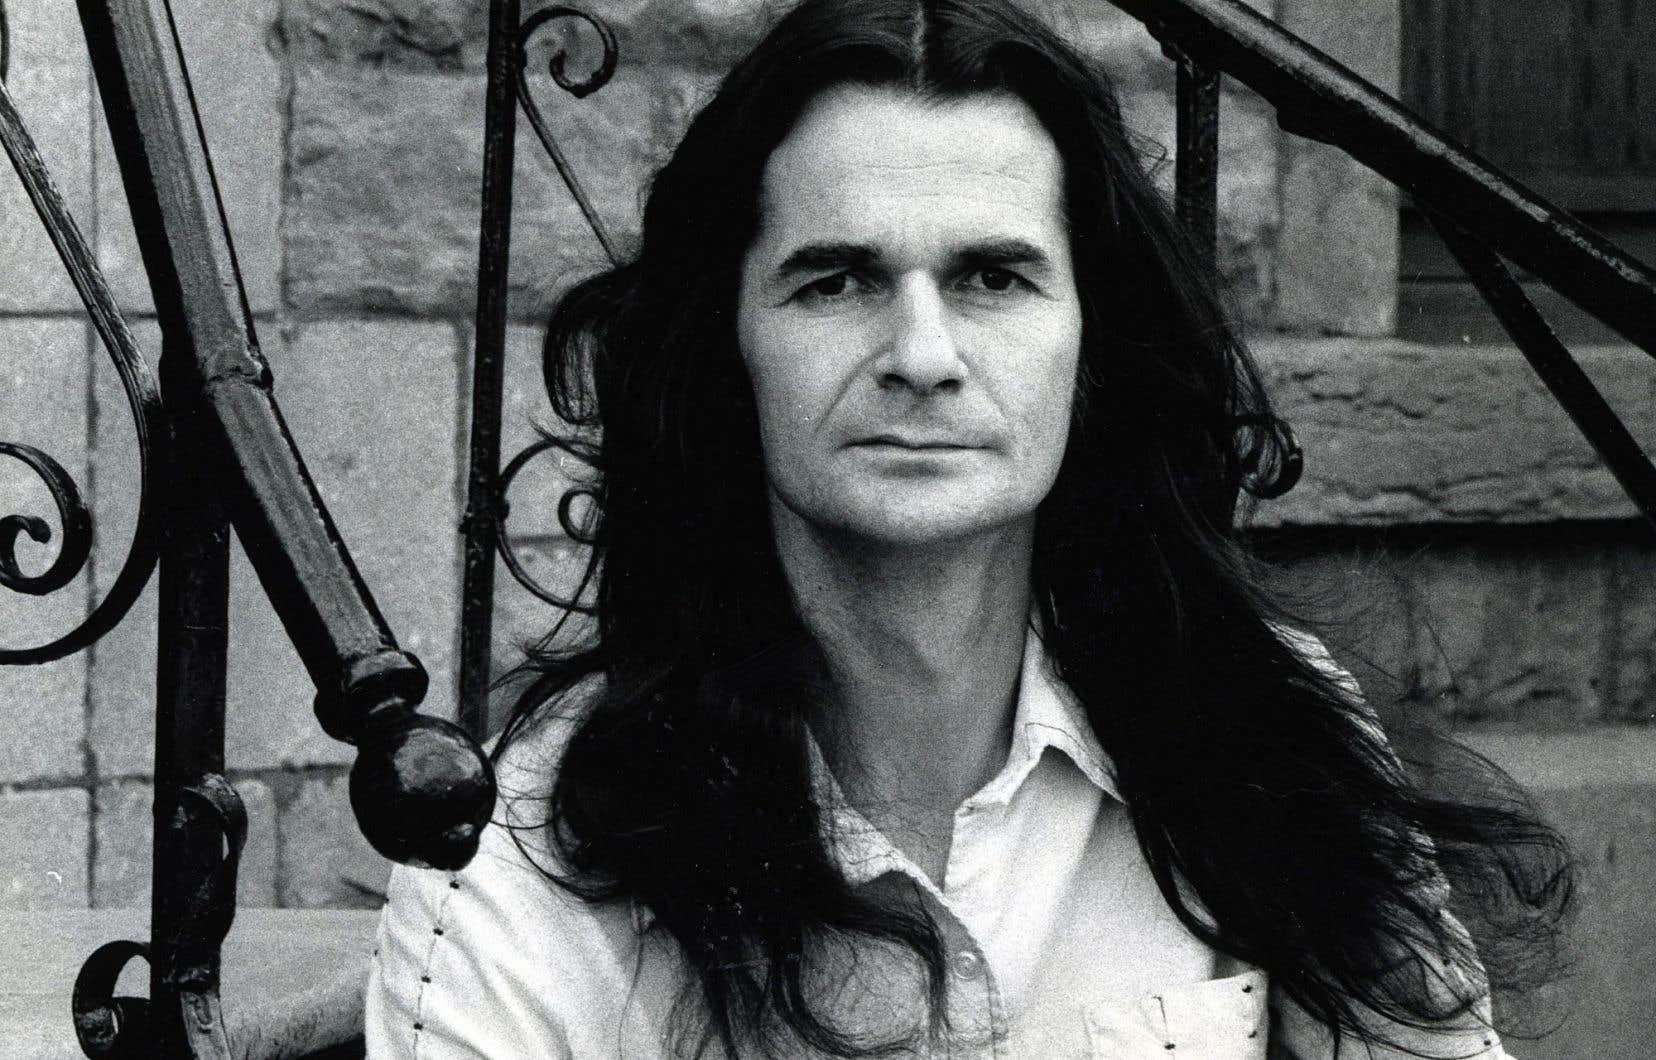 Gilbert Langevin